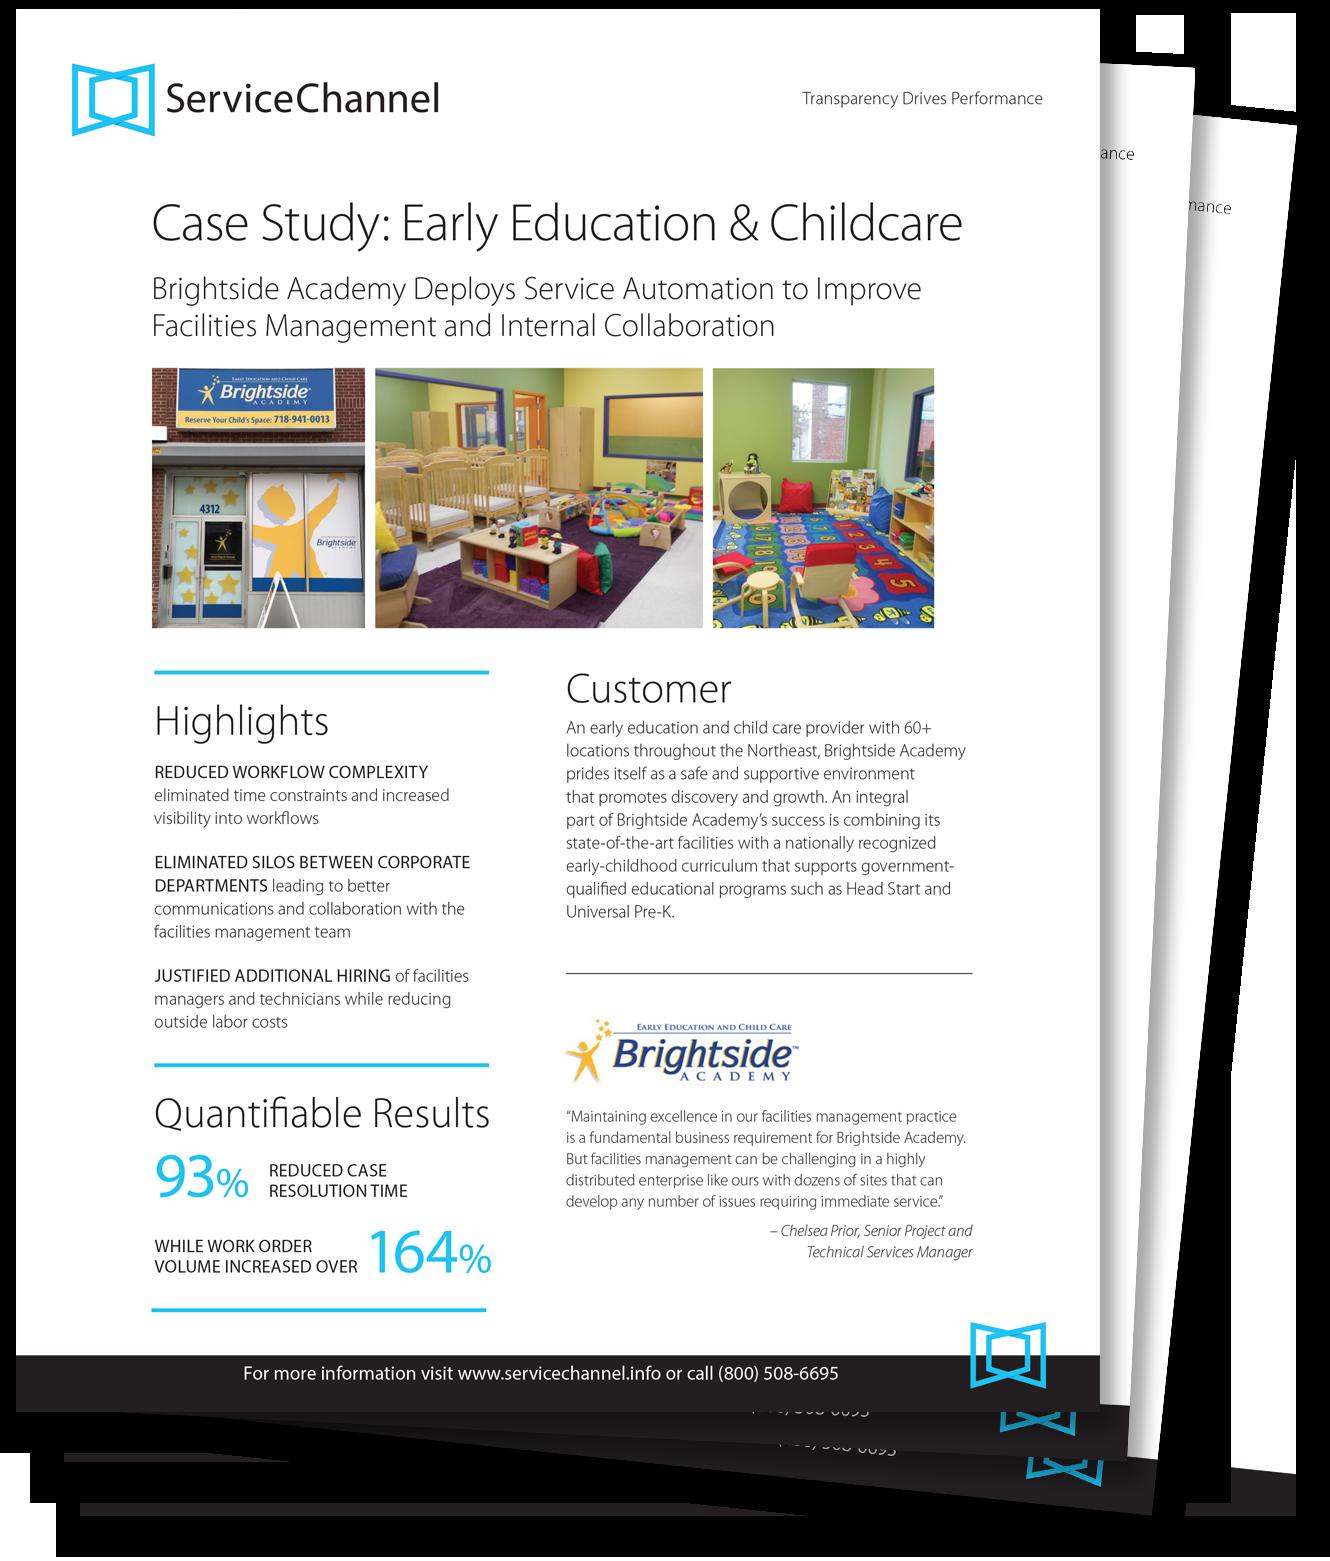 Education__Childcare_Facilities_Management_Case_Study_by_ServiceChannel_CTA.png